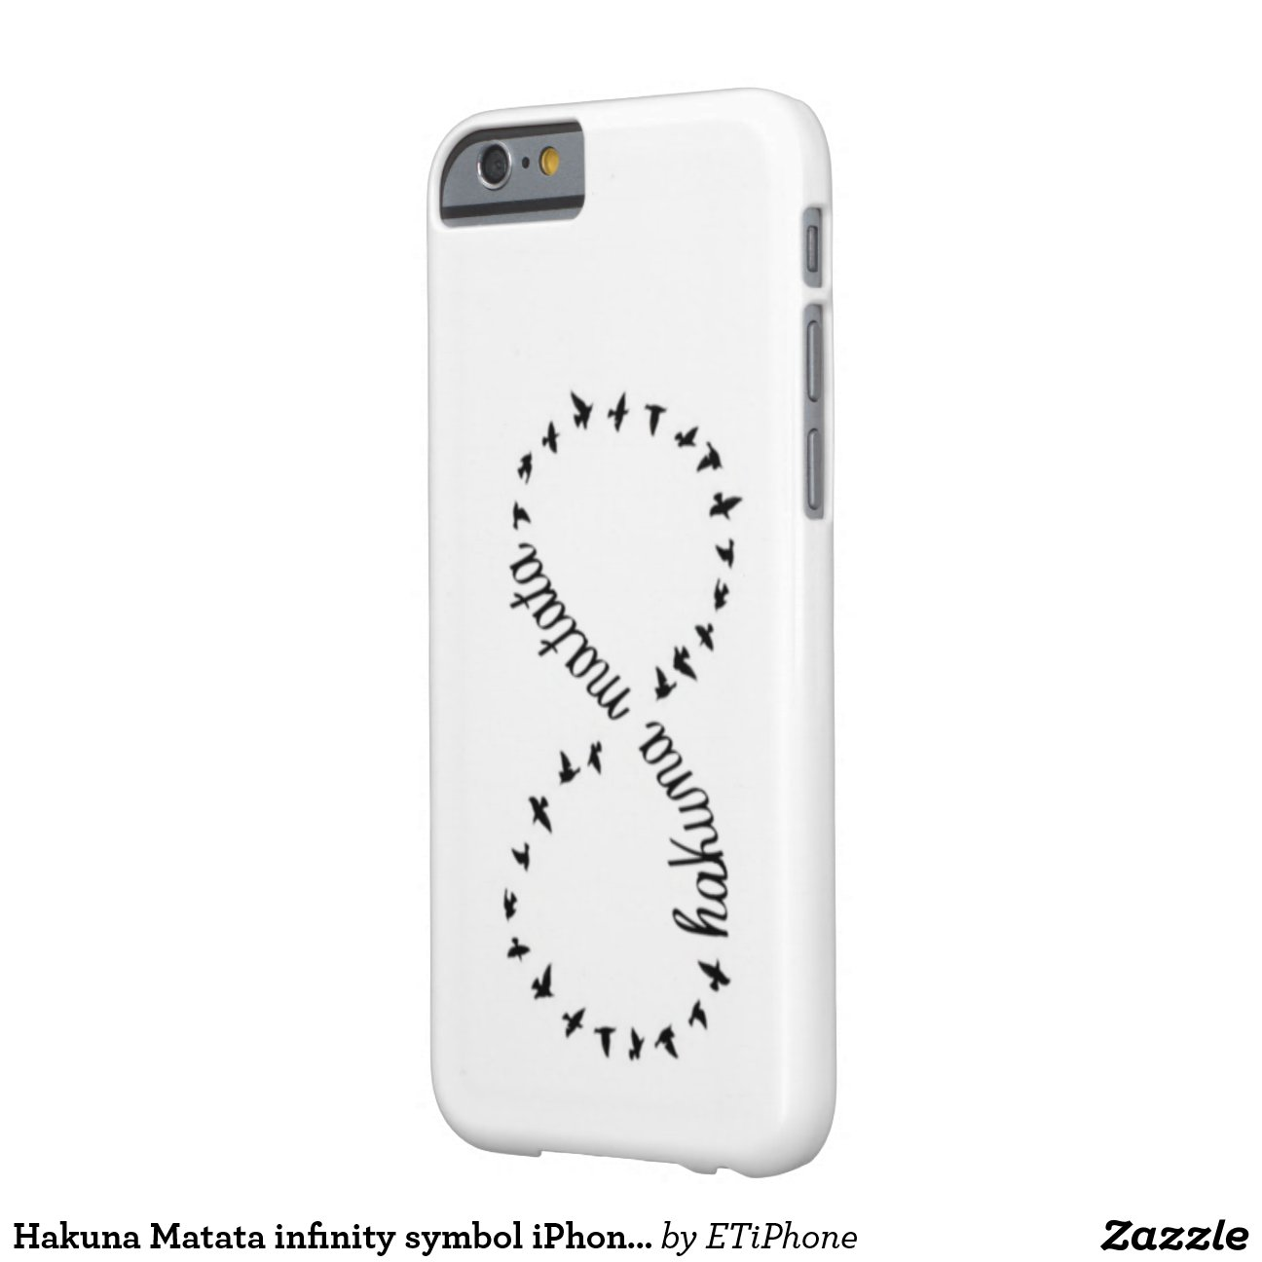 Hakuna Matata Iphone 4 Case